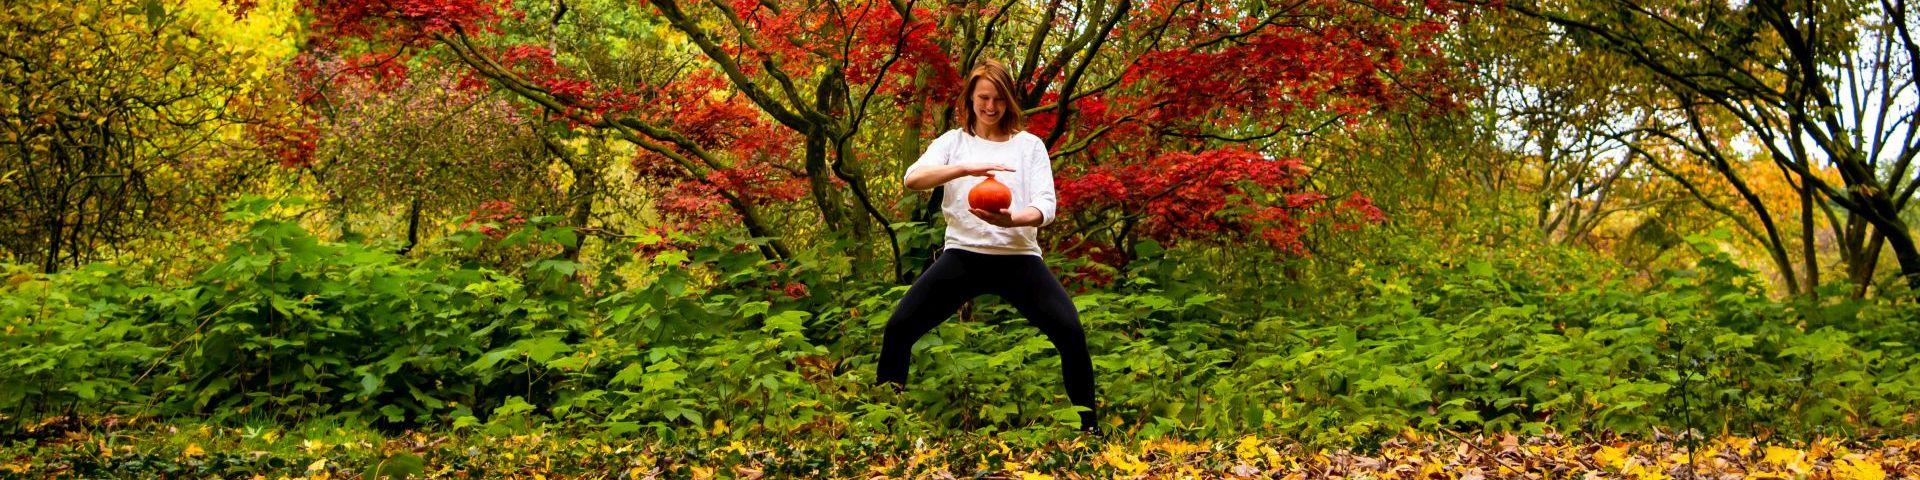 qigong - Banner_Leefstijlcoach-Wageningen-Ede-Bennekom-yoga-coaching-personal-training_DSC_3810